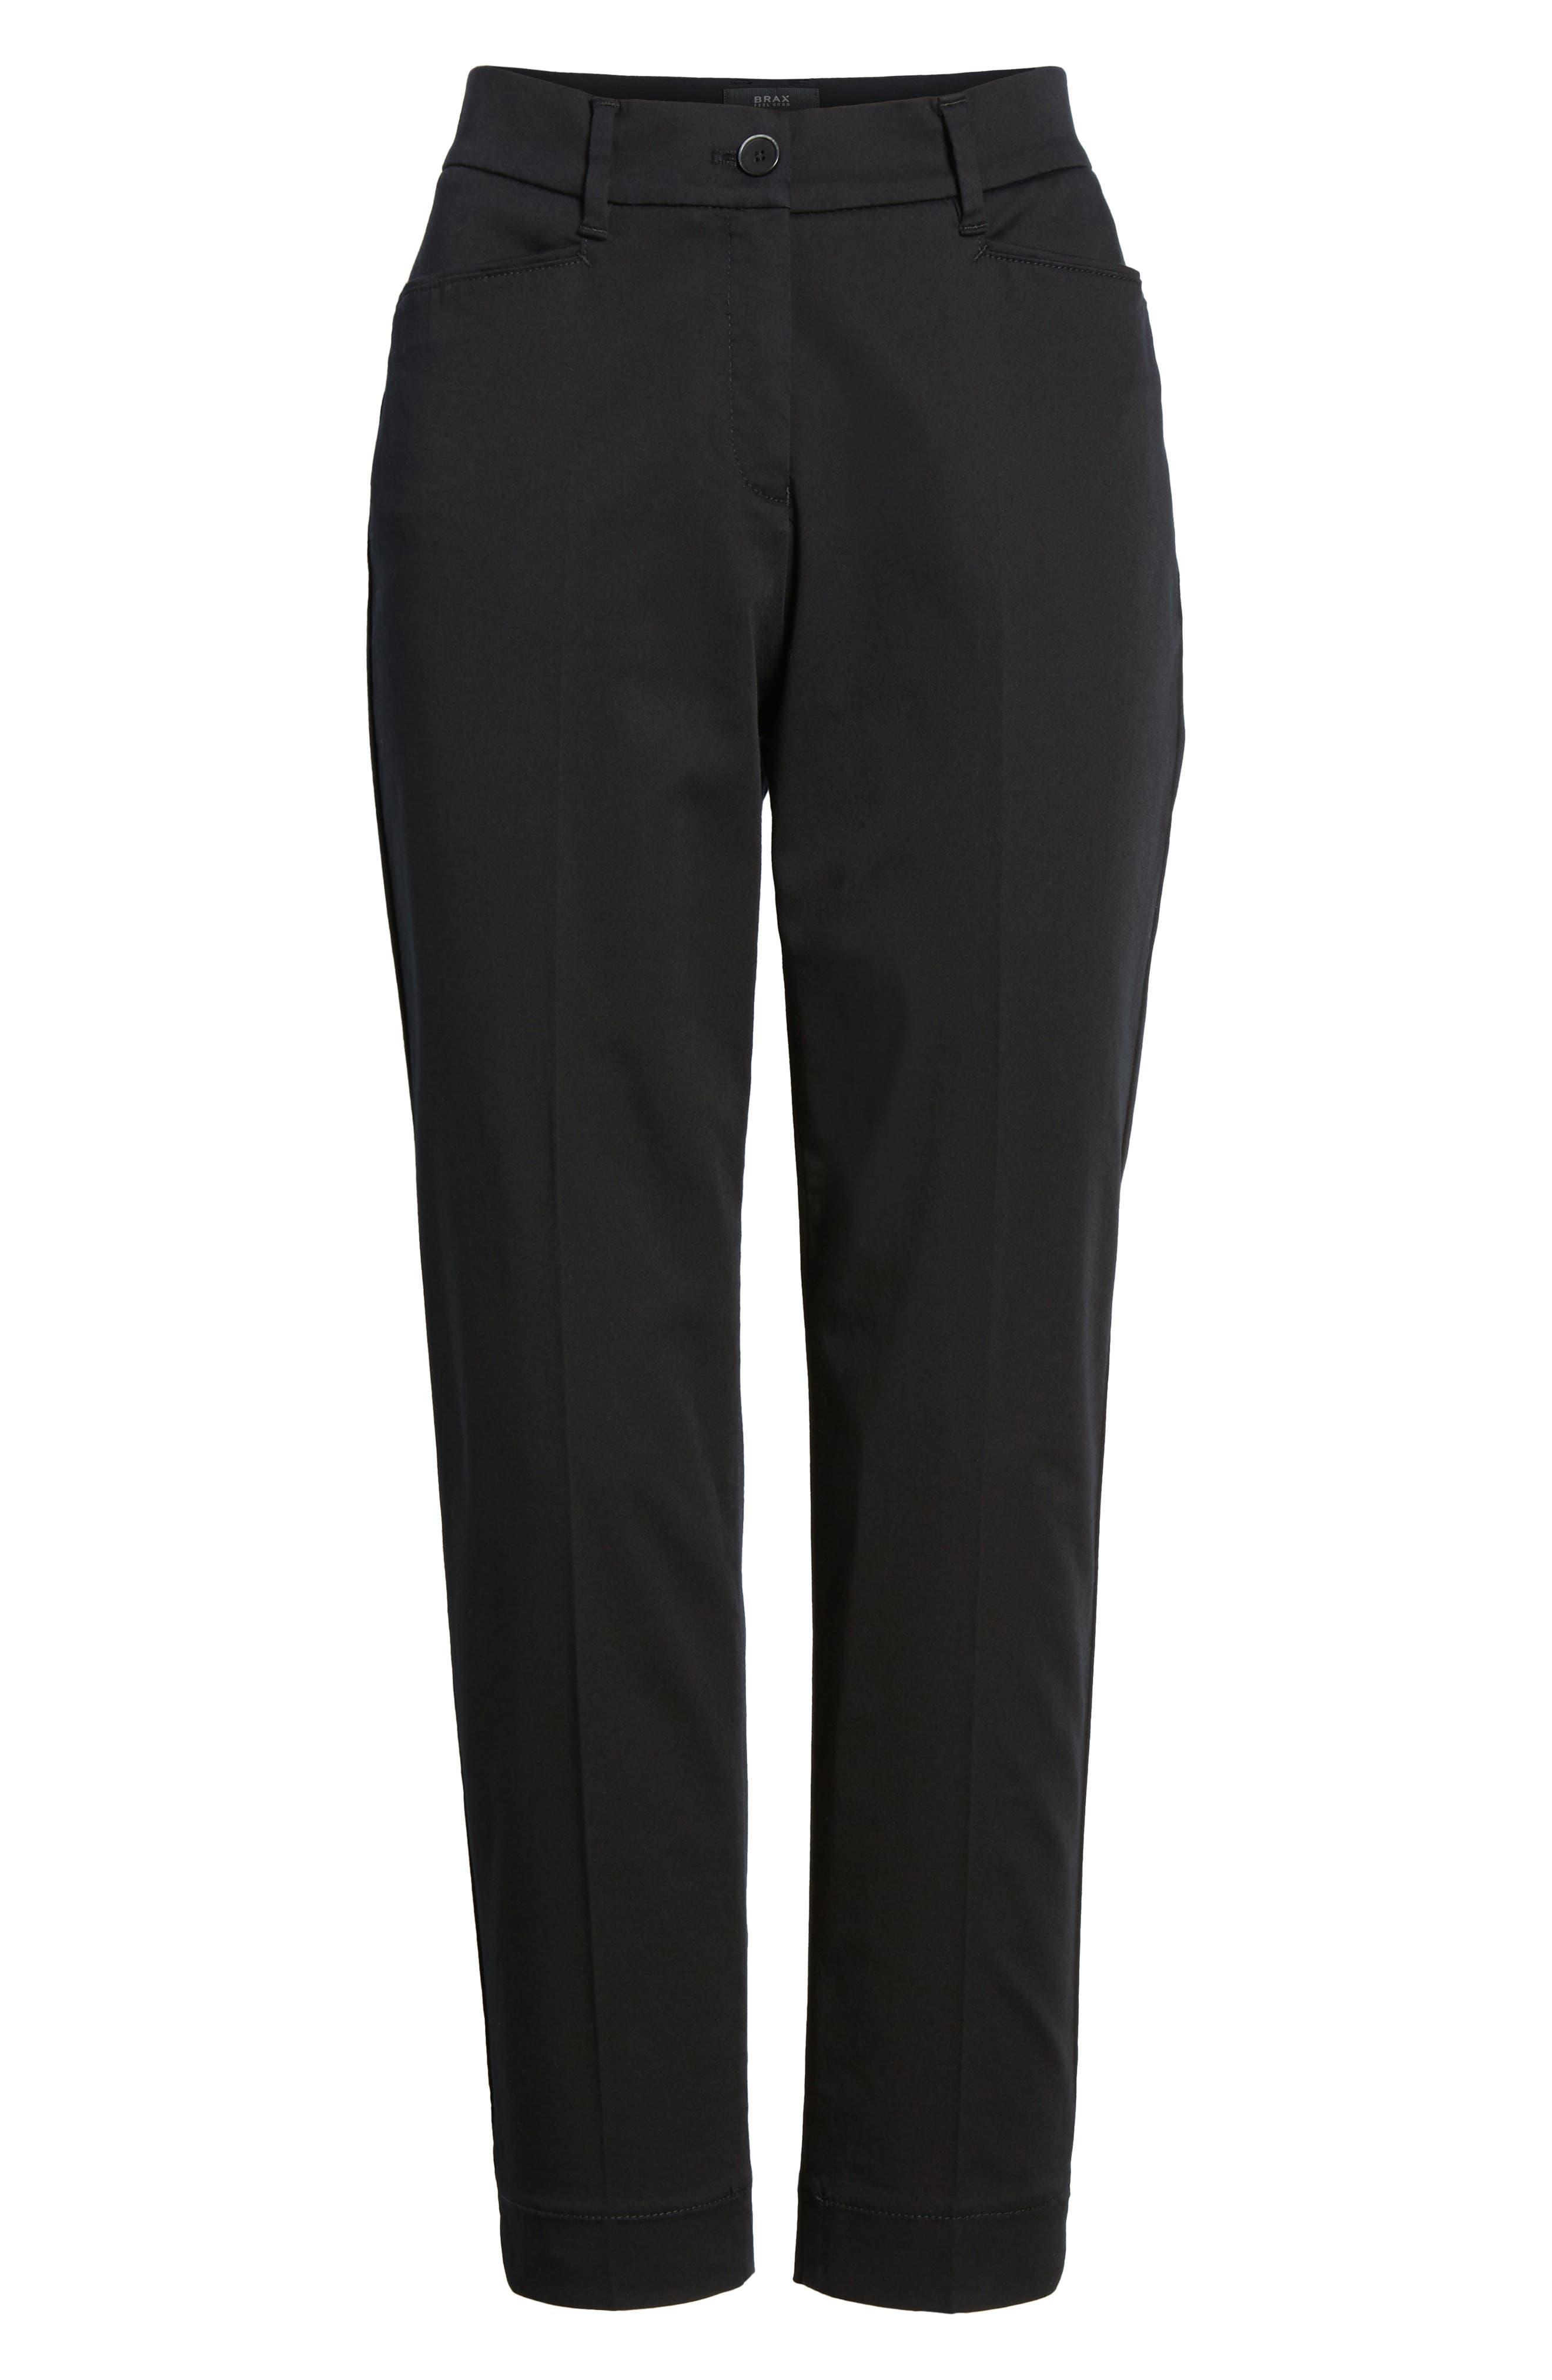 Straight Leg Cropped Trousers,                             Alternate thumbnail 7, color,                             BLACK